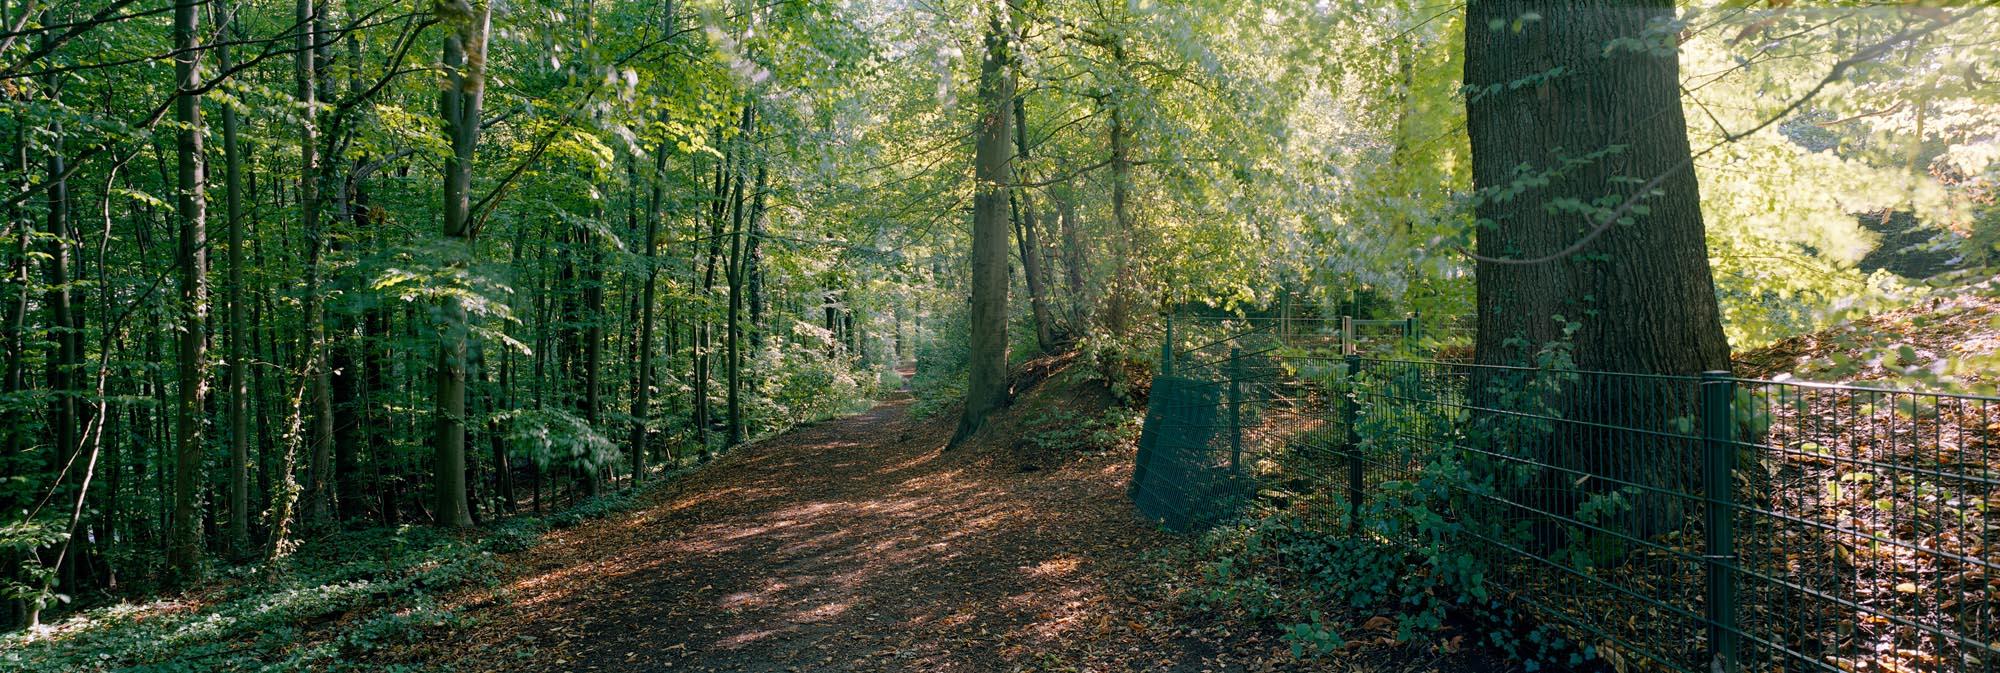 Wald in GL Wald in Bergisch Gladbach